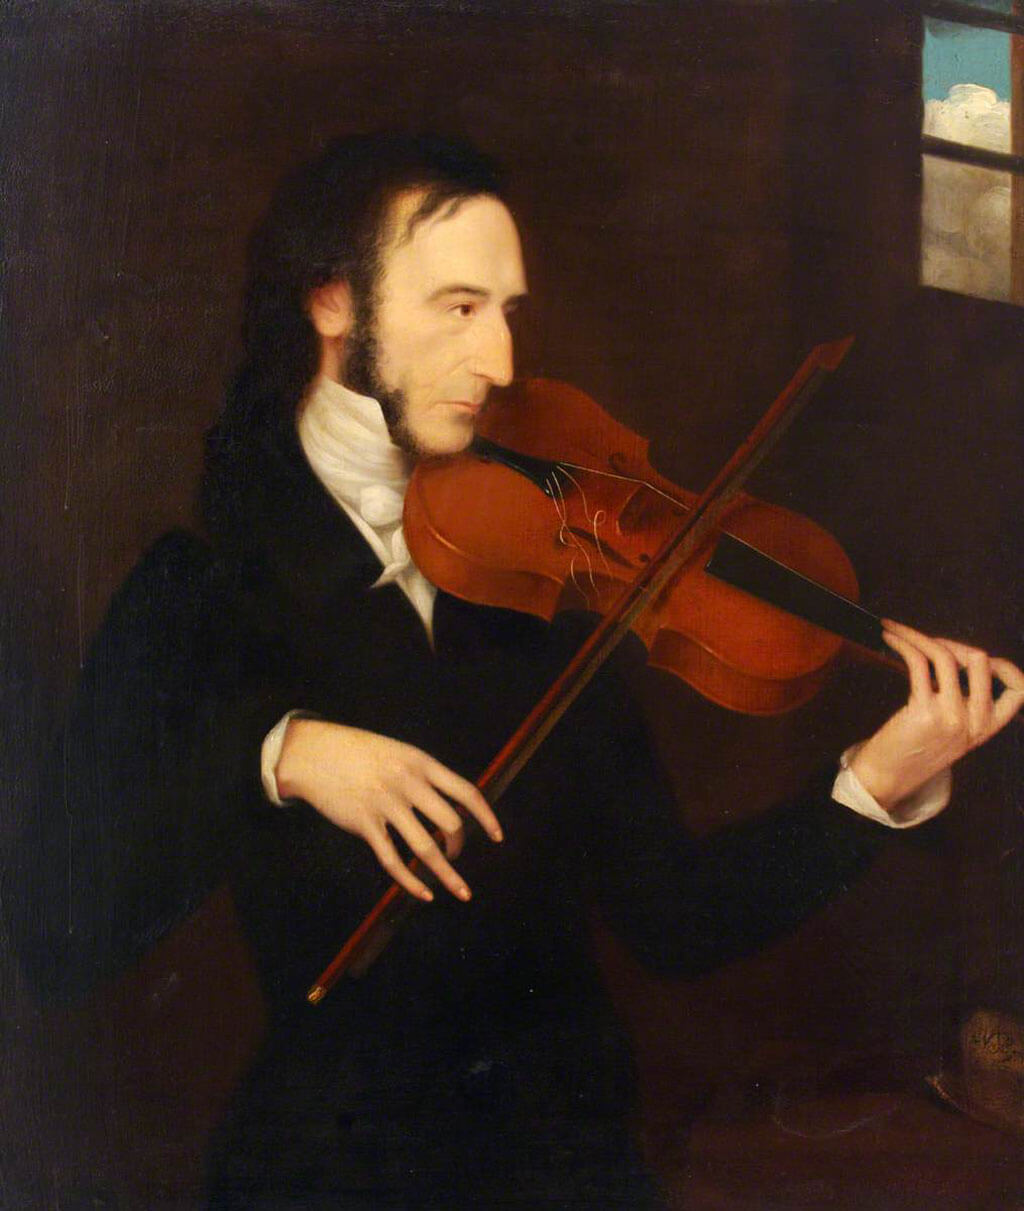 Niccolò Paganini (1782–1840), Daniel Maclise, Royal Academy of Music